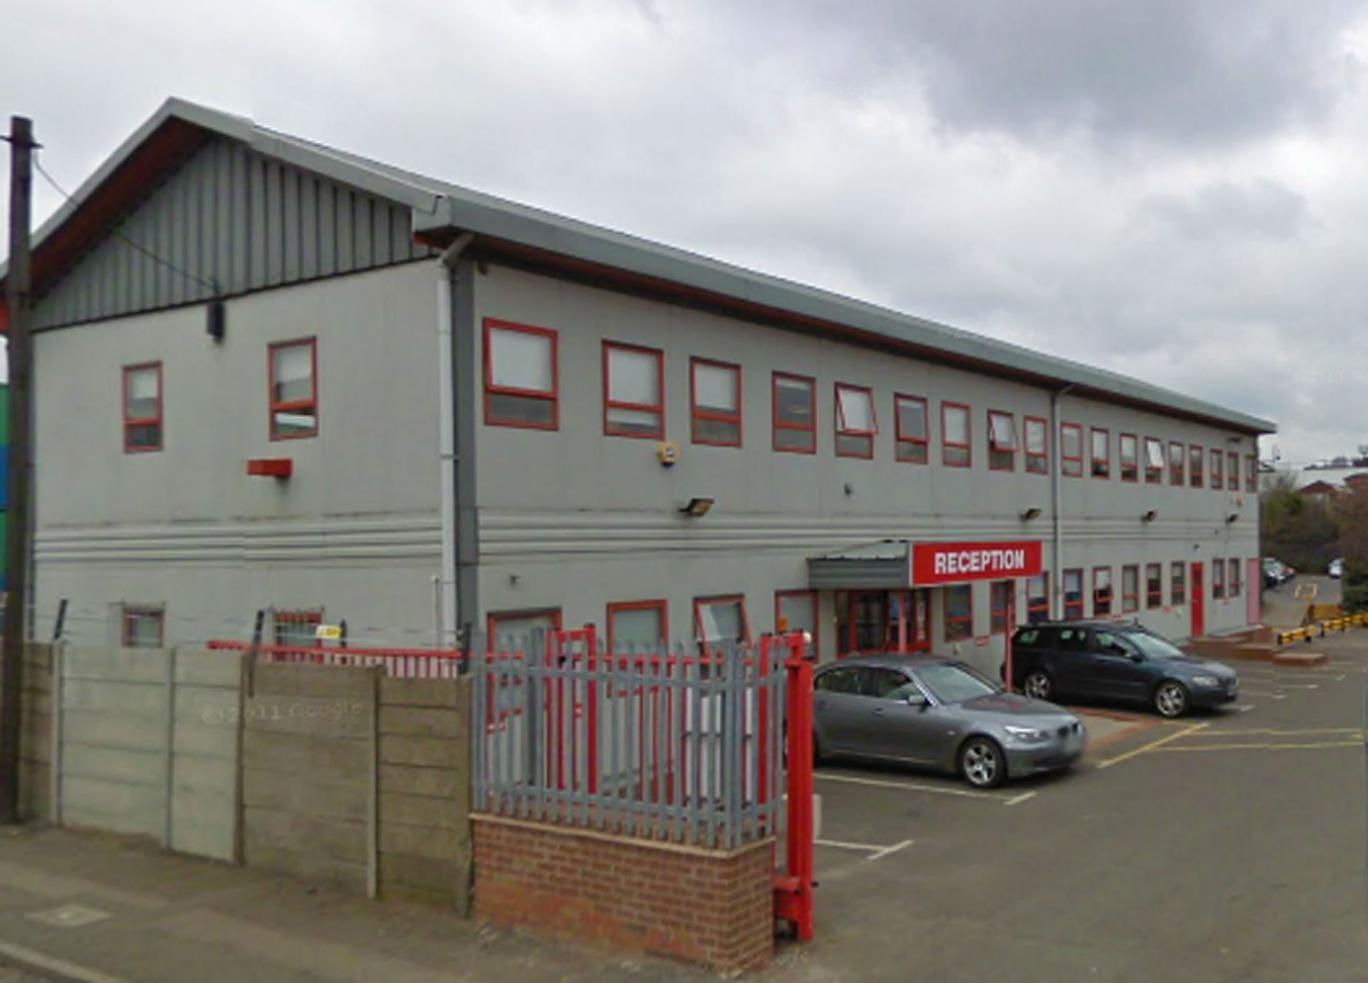 Biffa Recycling plant in Tipton near Birmingham